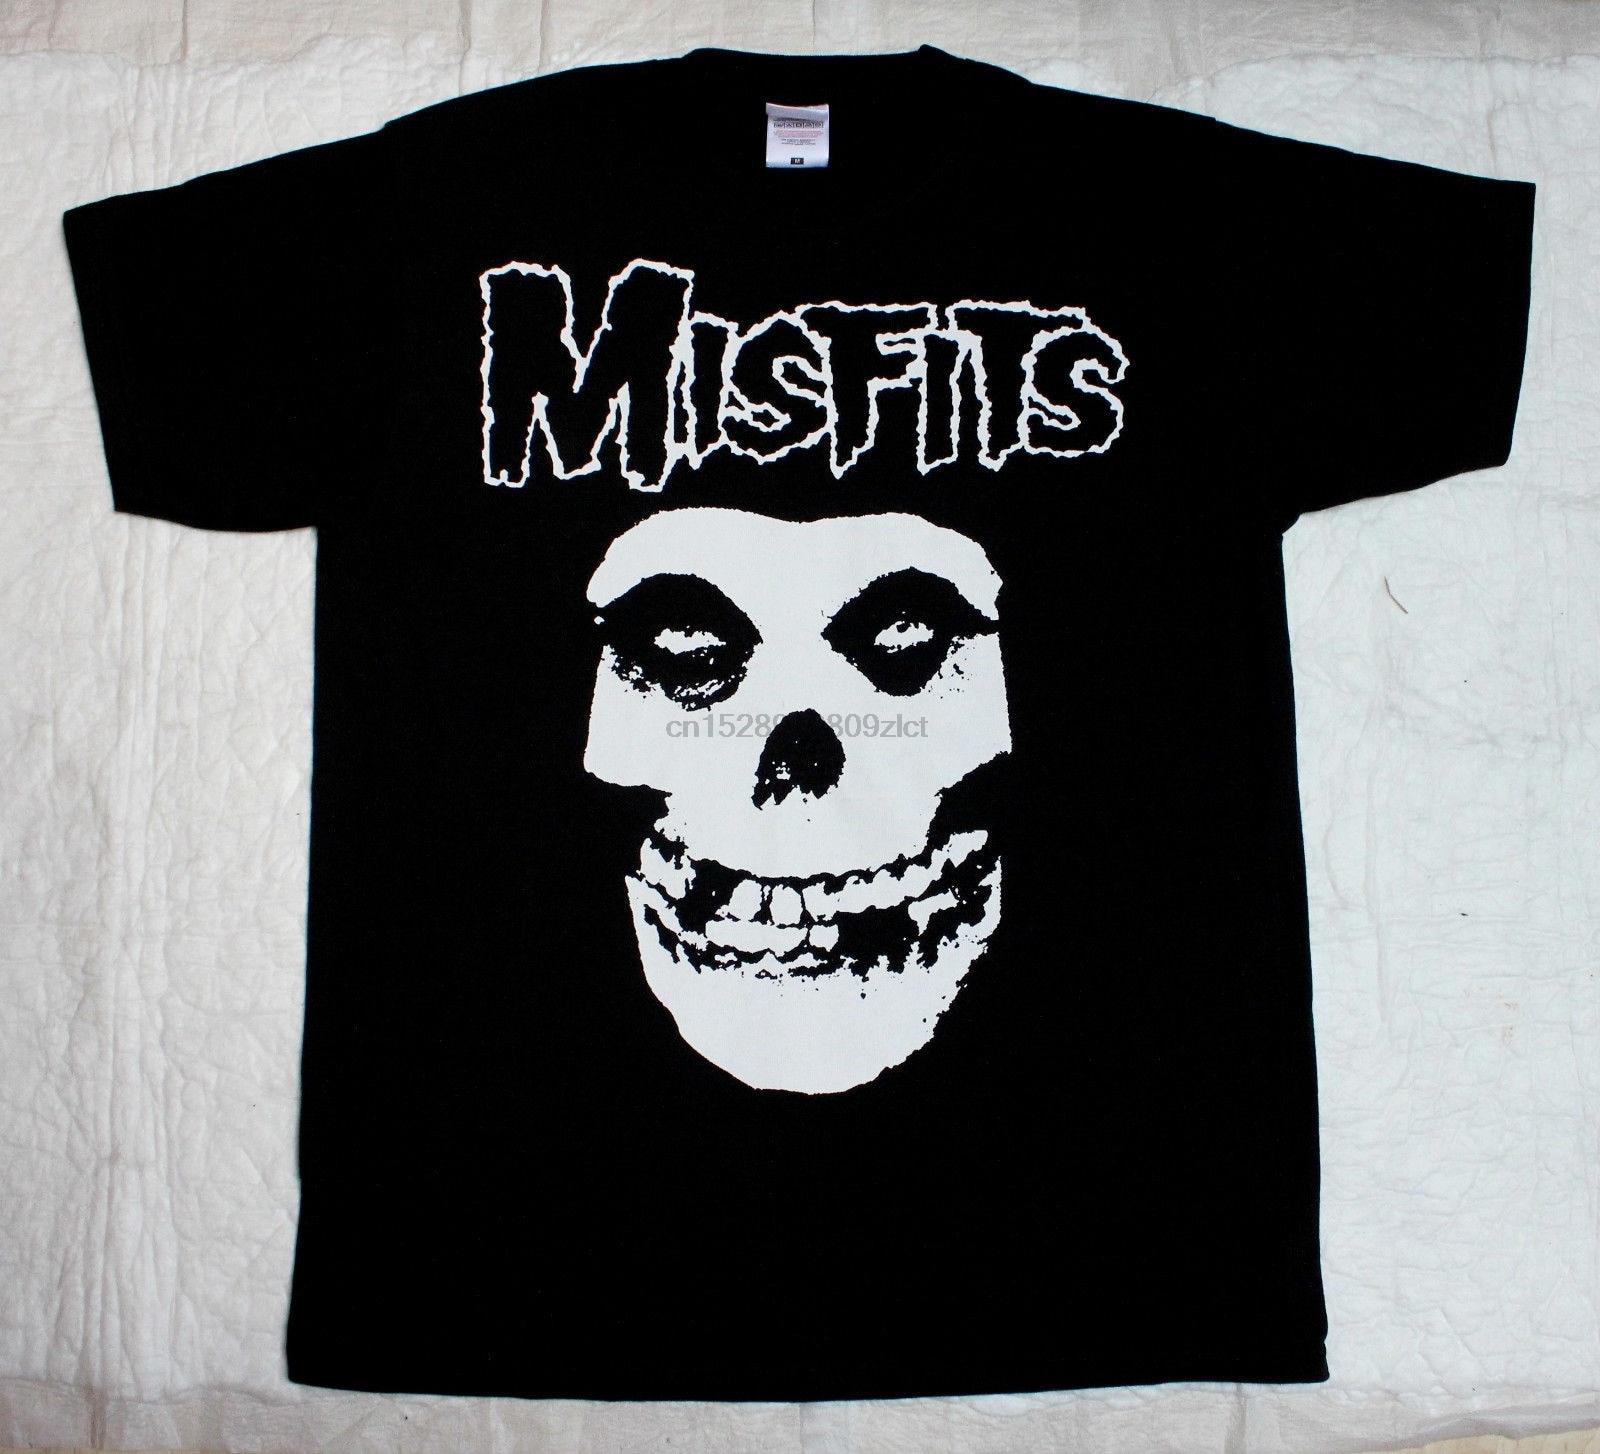 Los incompatibles calavera Psychobilly Horror Punk Goth S 2Xl hombres camiseta negra